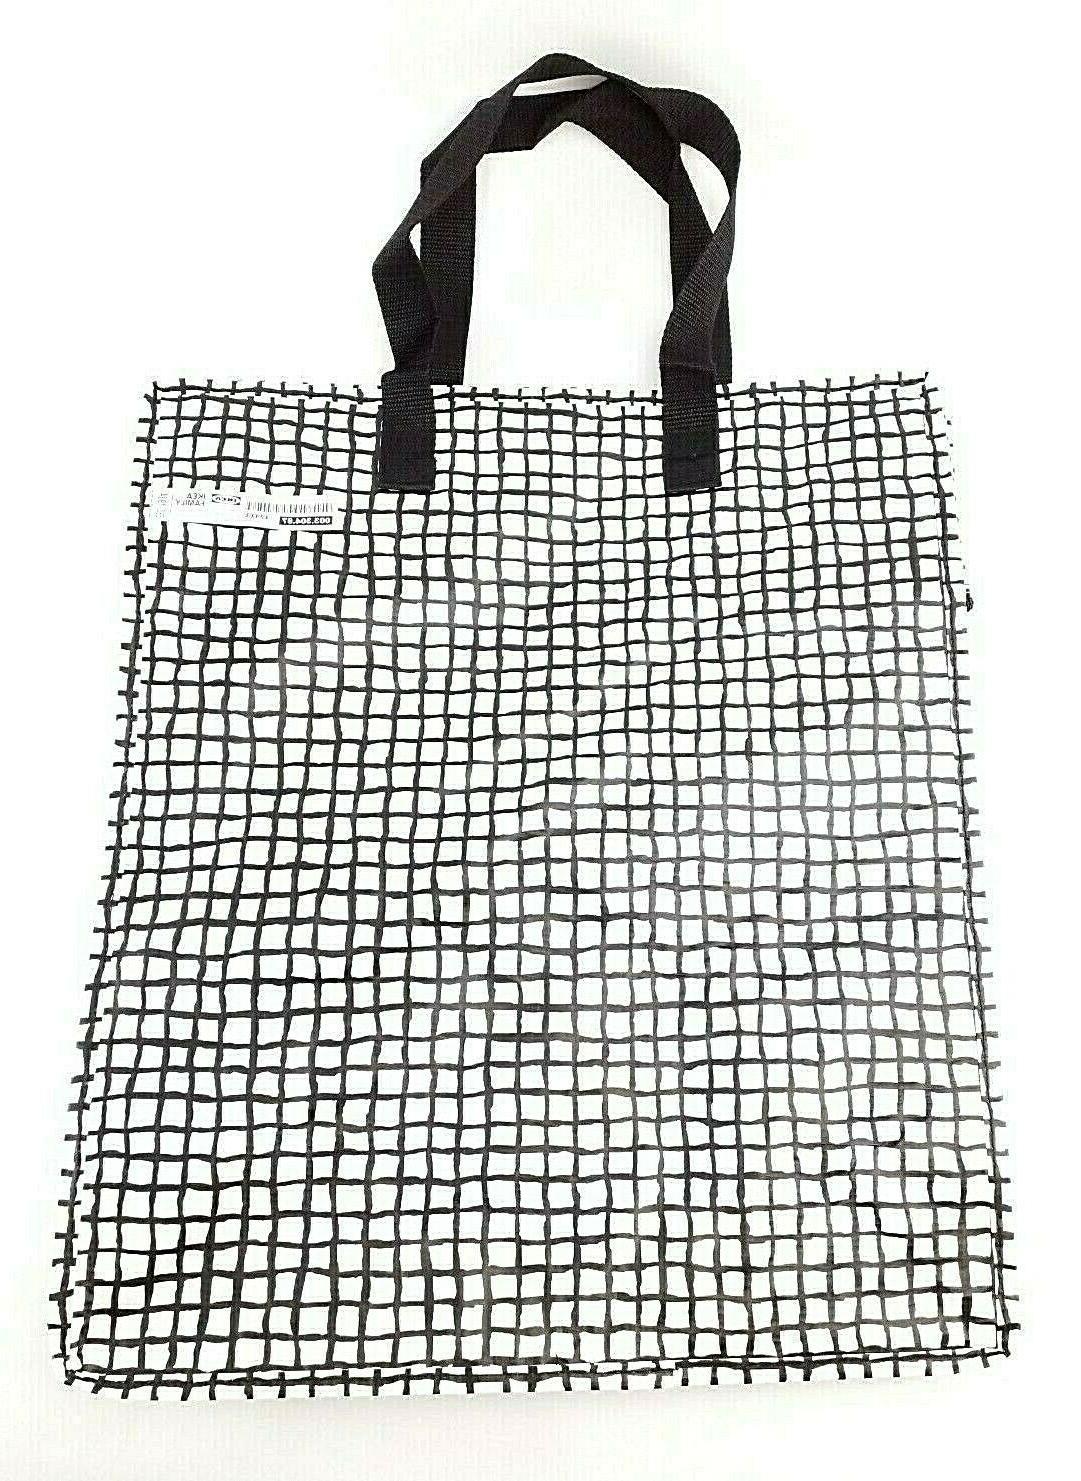 IKEA Knalla Zip Bag White Tote Reusable capacity